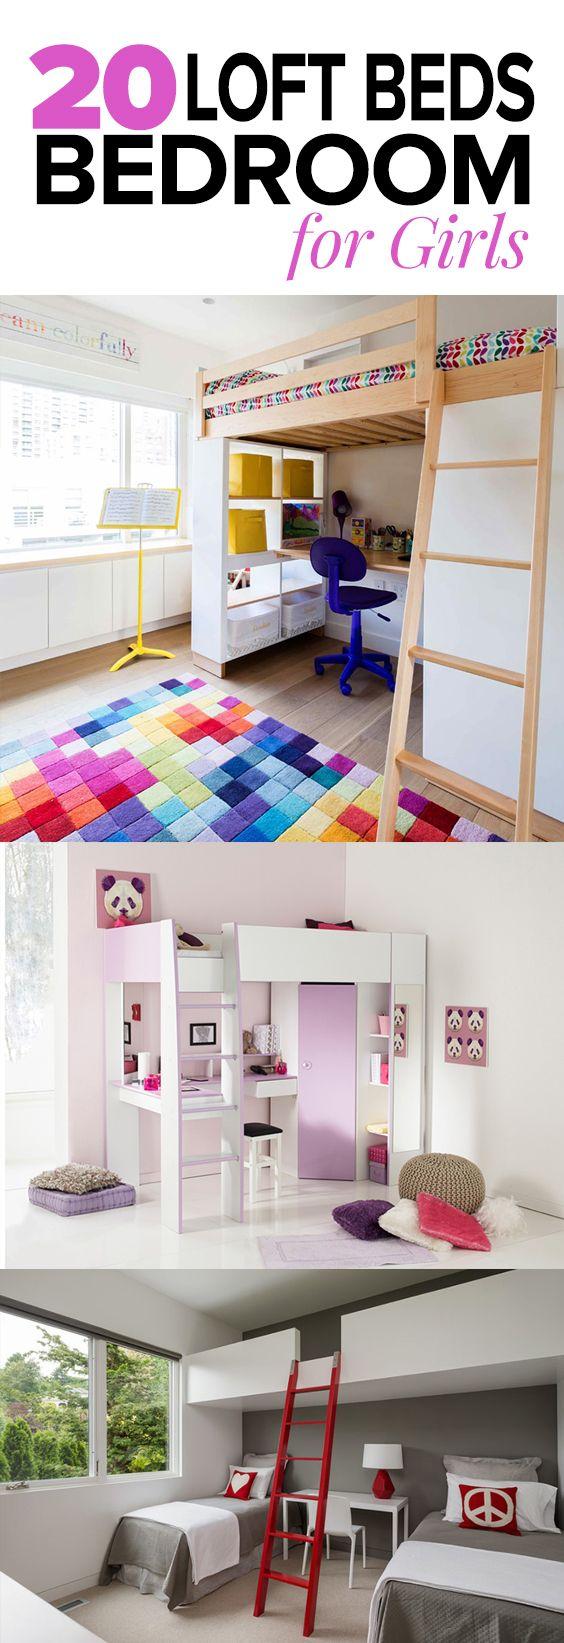 Loft Beds with Desk in 20 Chic Girls Bedroom Bunk beds